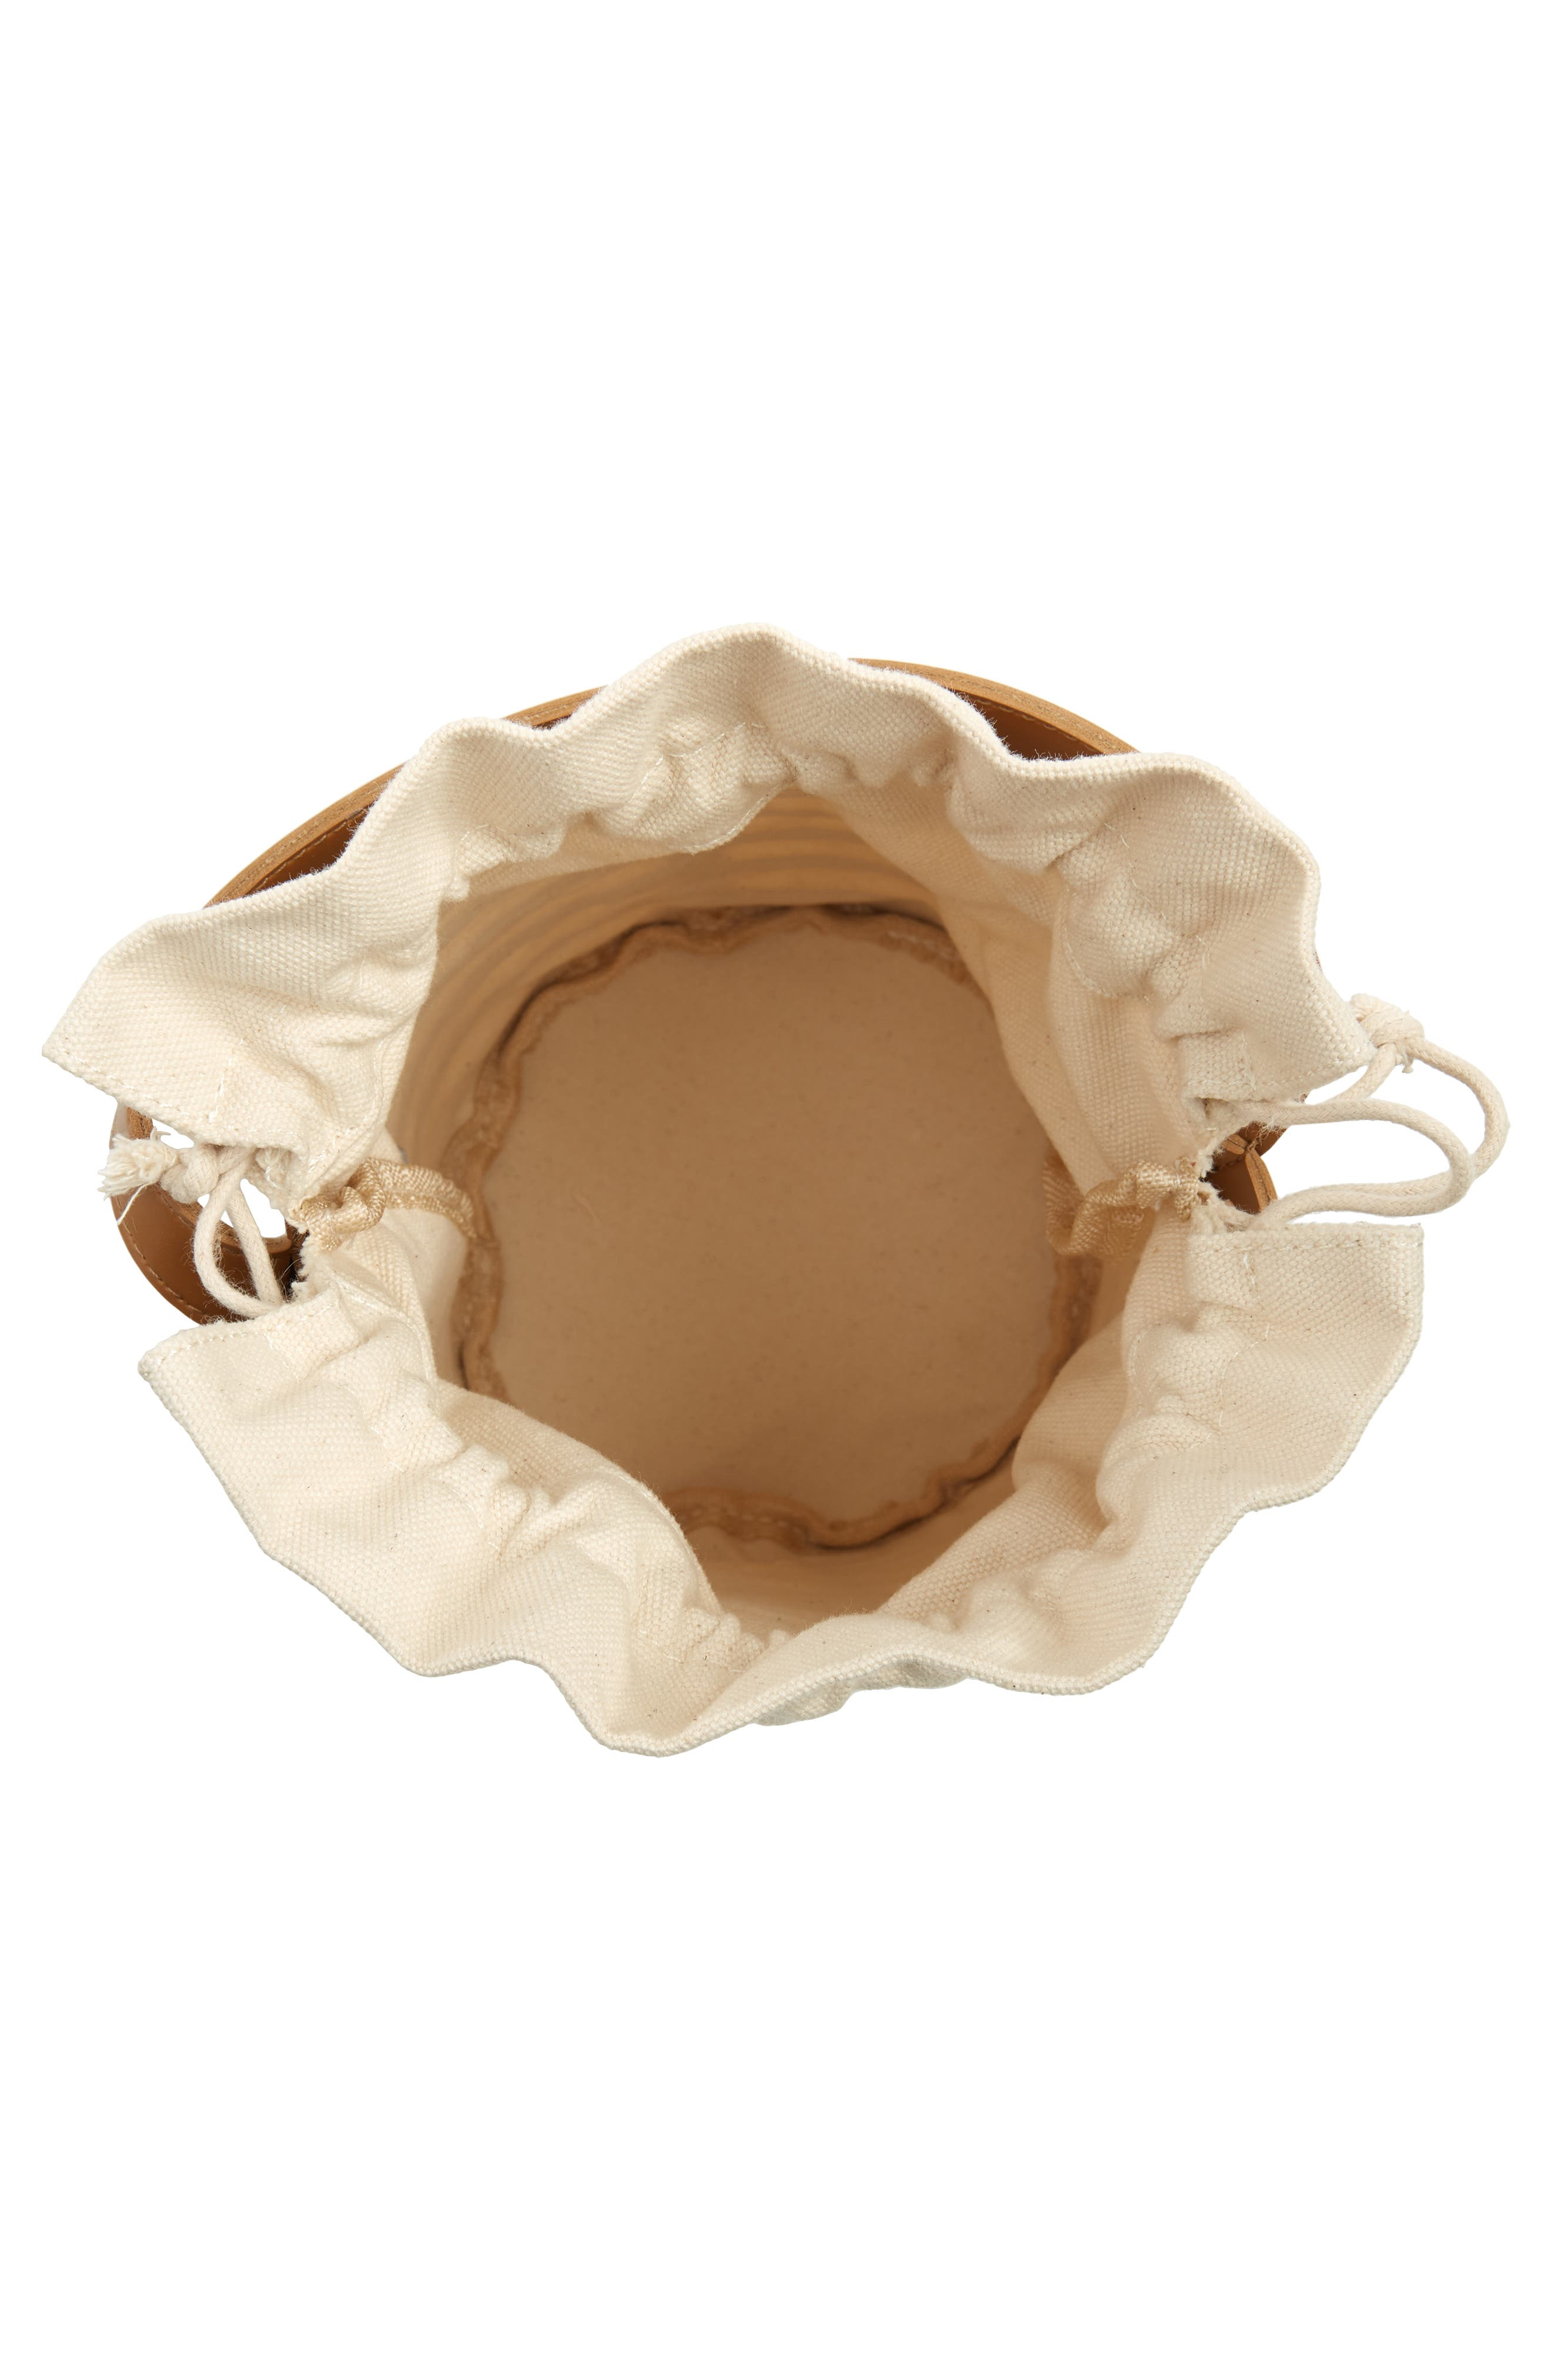 Cutout Round Bucket Crossbody Bag,                             Alternate thumbnail 4, color,                             TAN